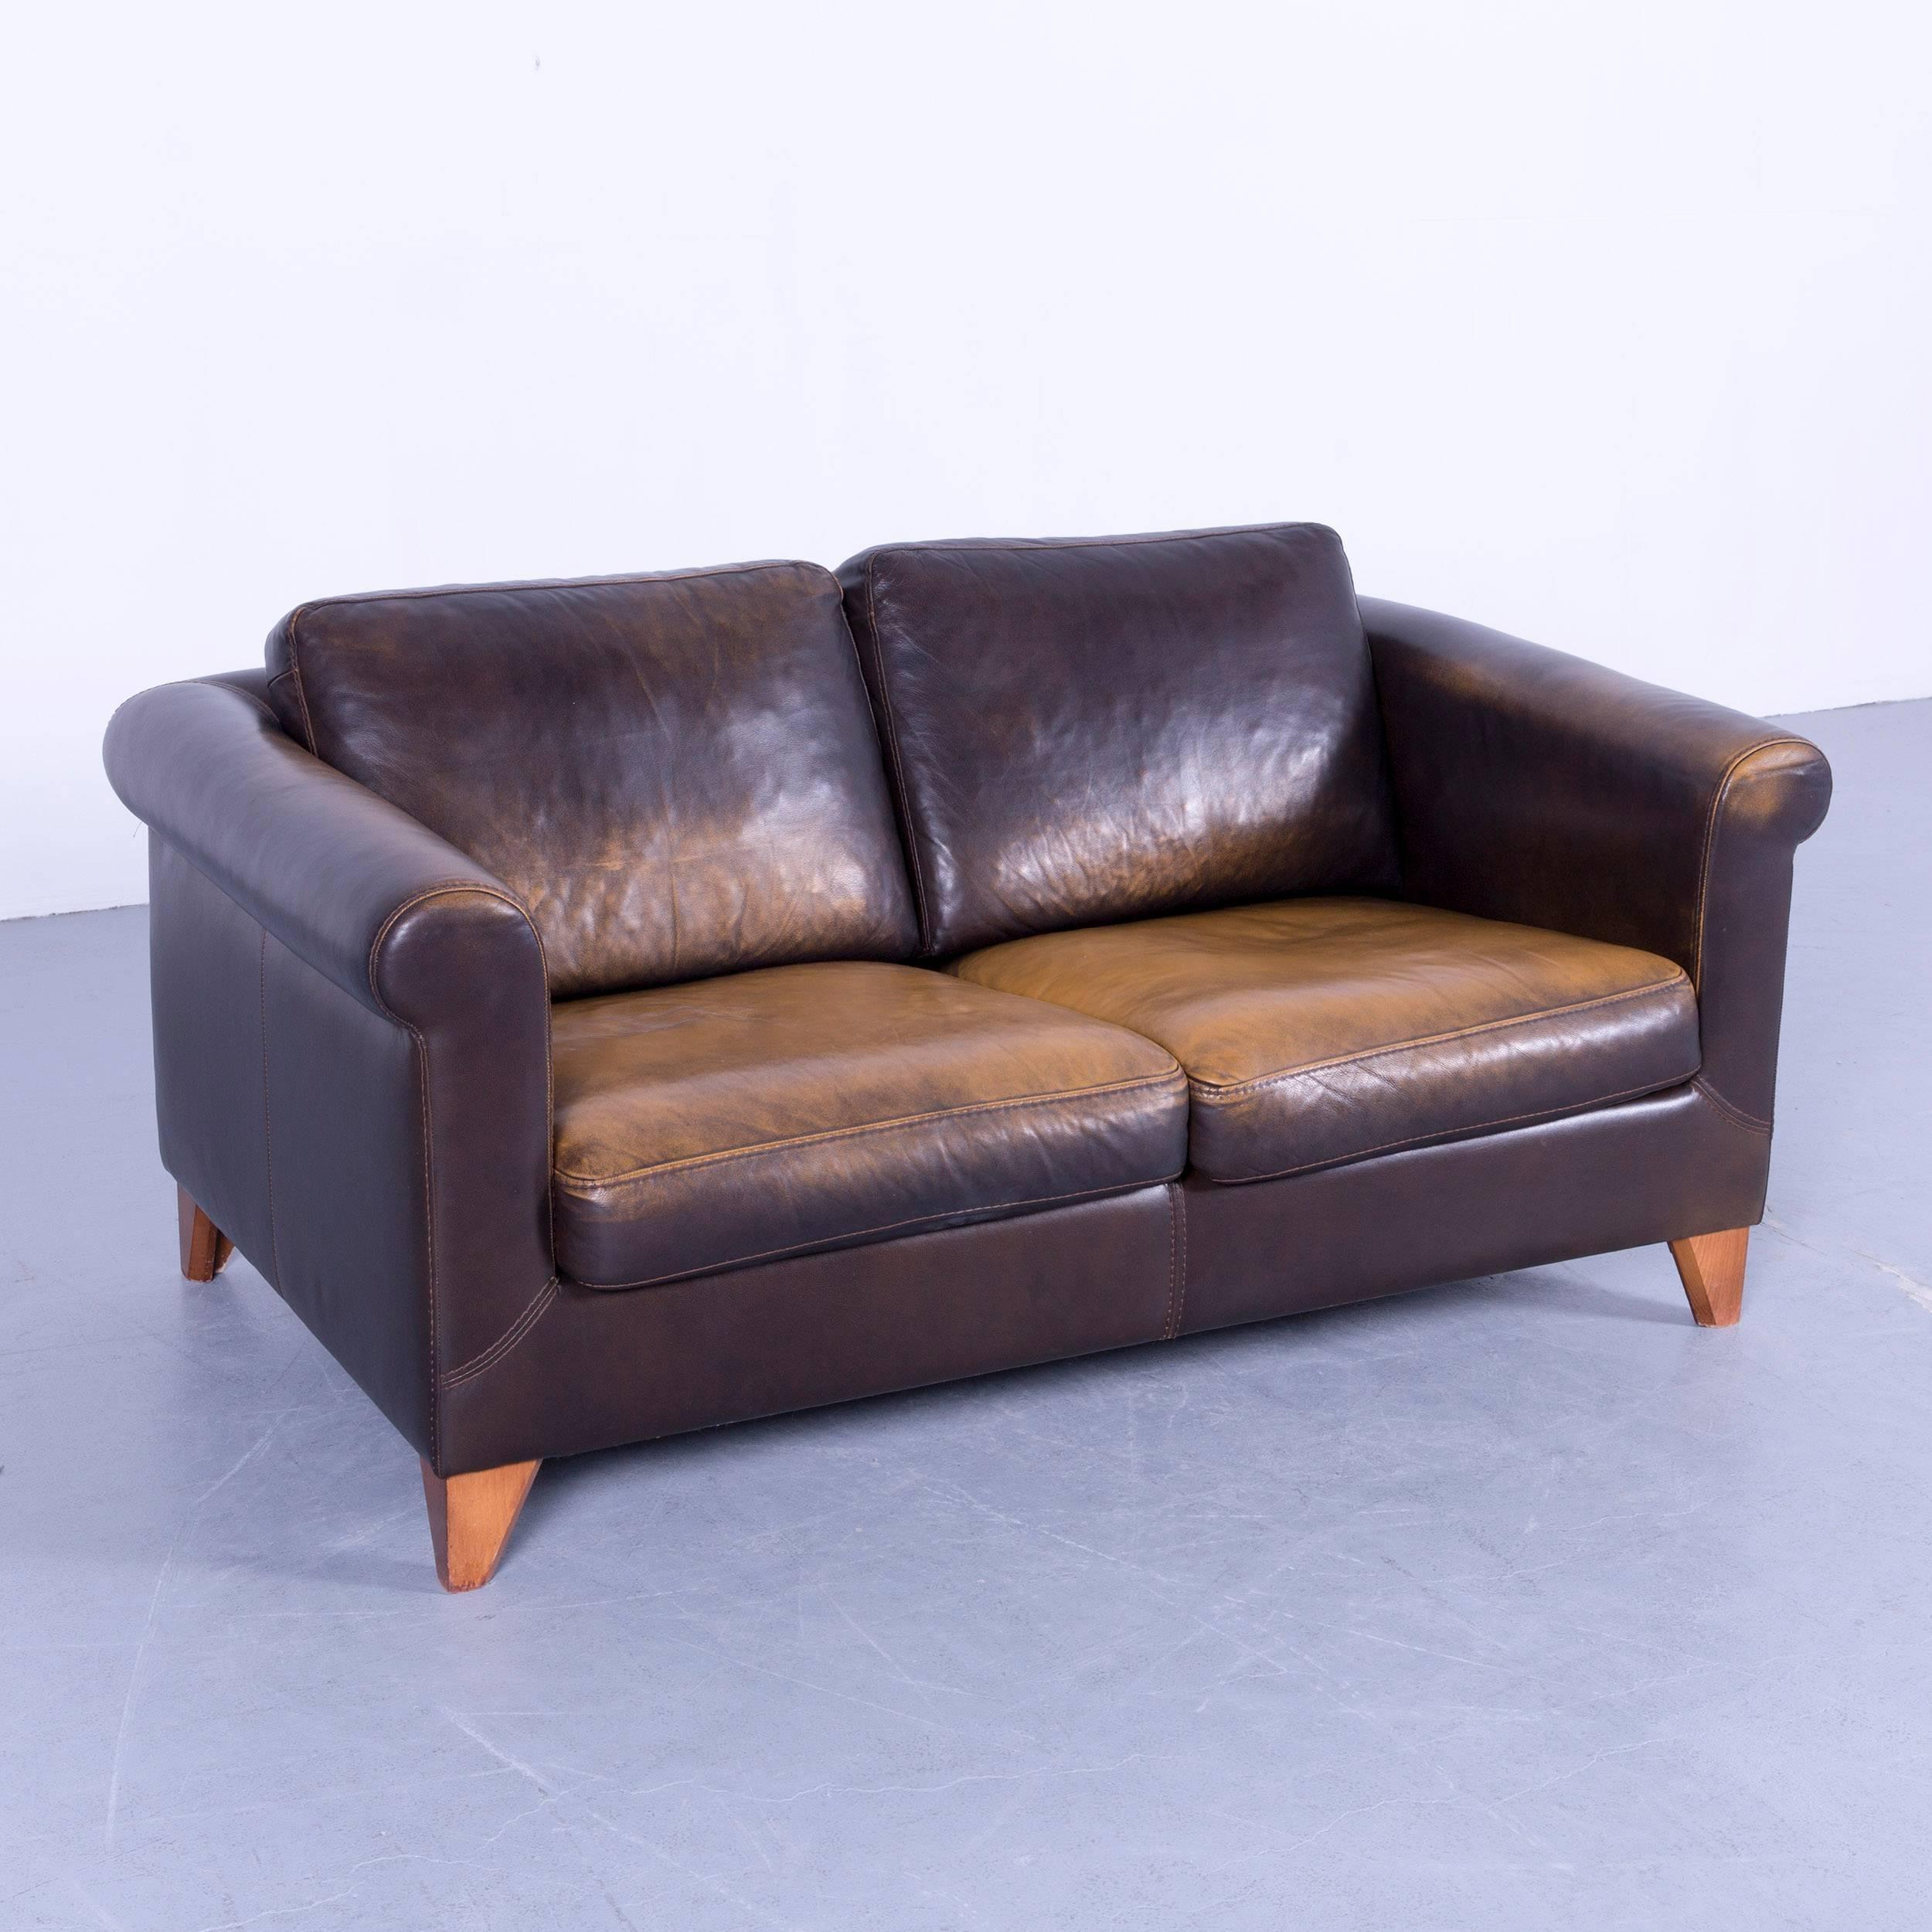 machalke sofa kaufen finest machalke sofa kaufen with machalke sofa kaufen machalke valentino. Black Bedroom Furniture Sets. Home Design Ideas